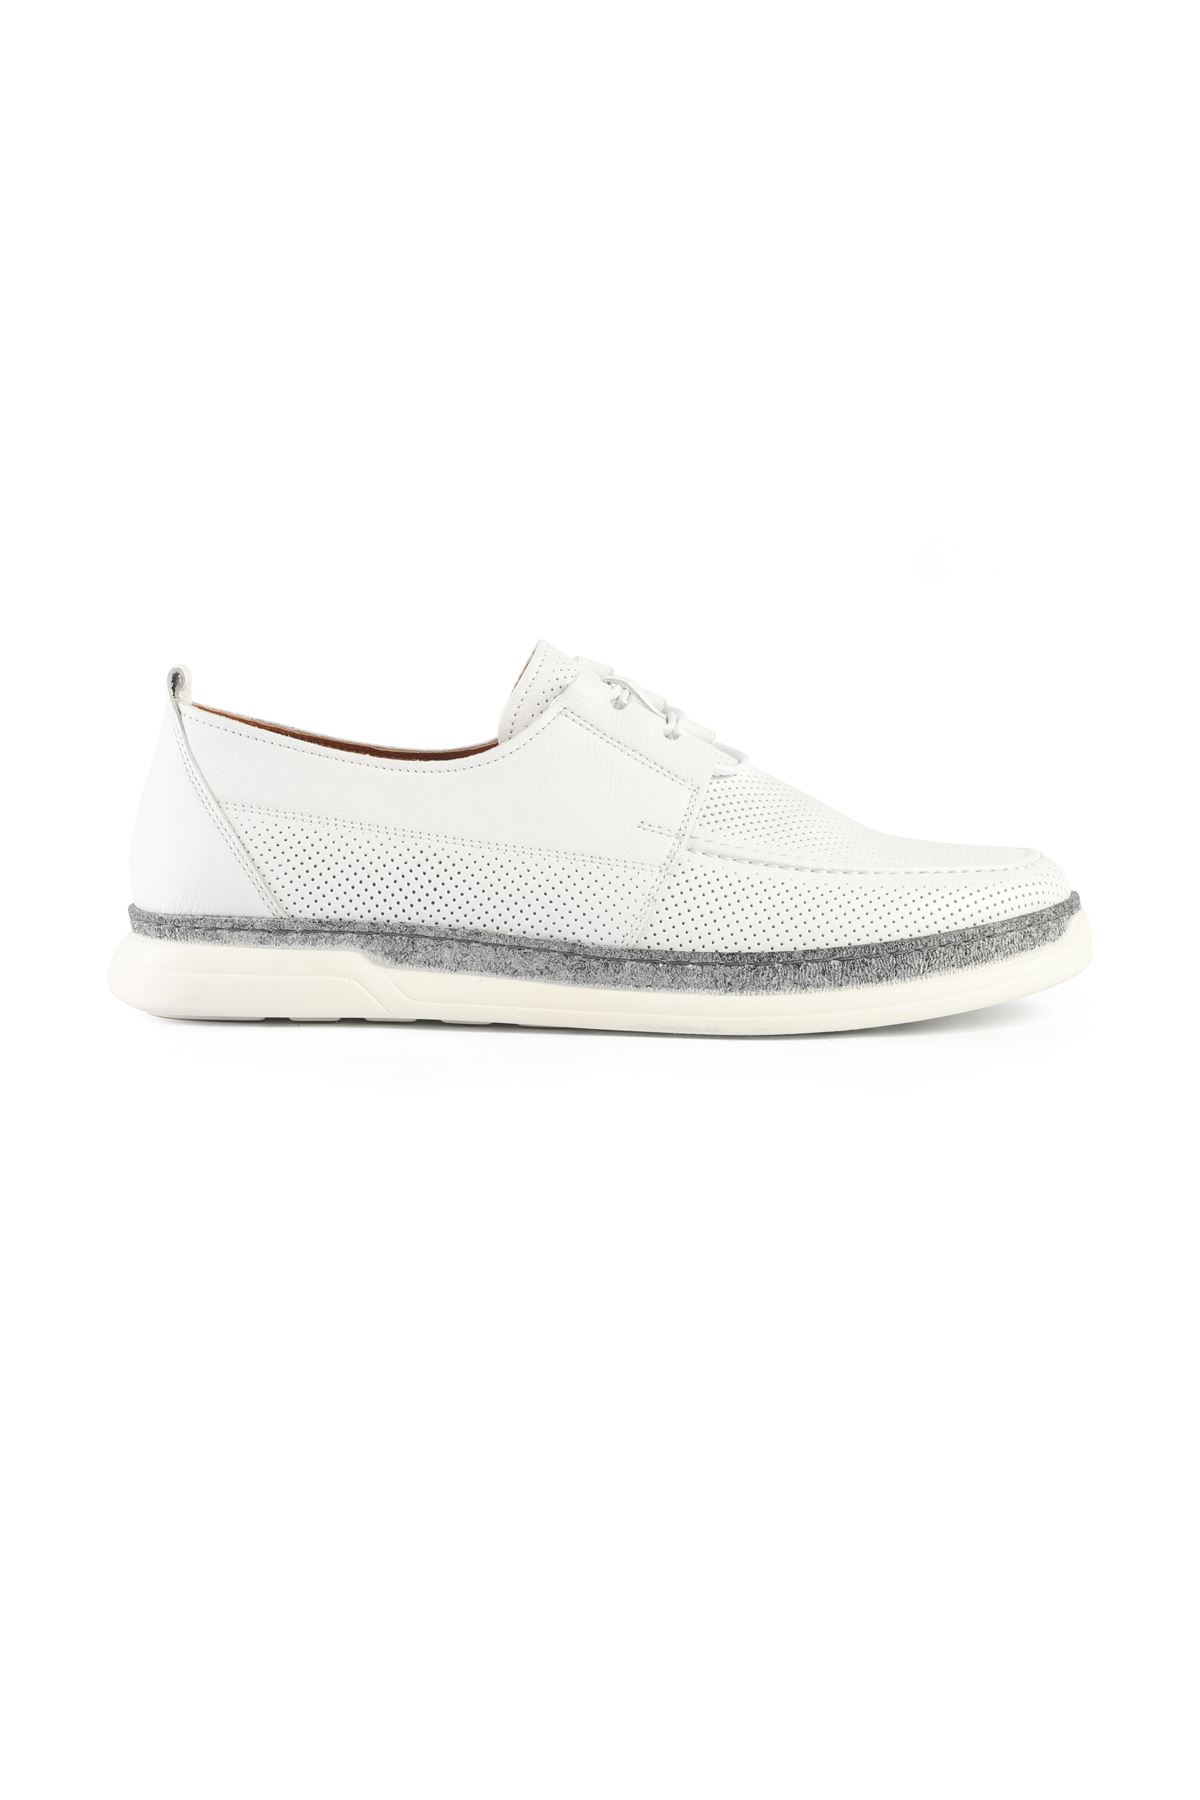 Libero L3418 White Loafer Shoes